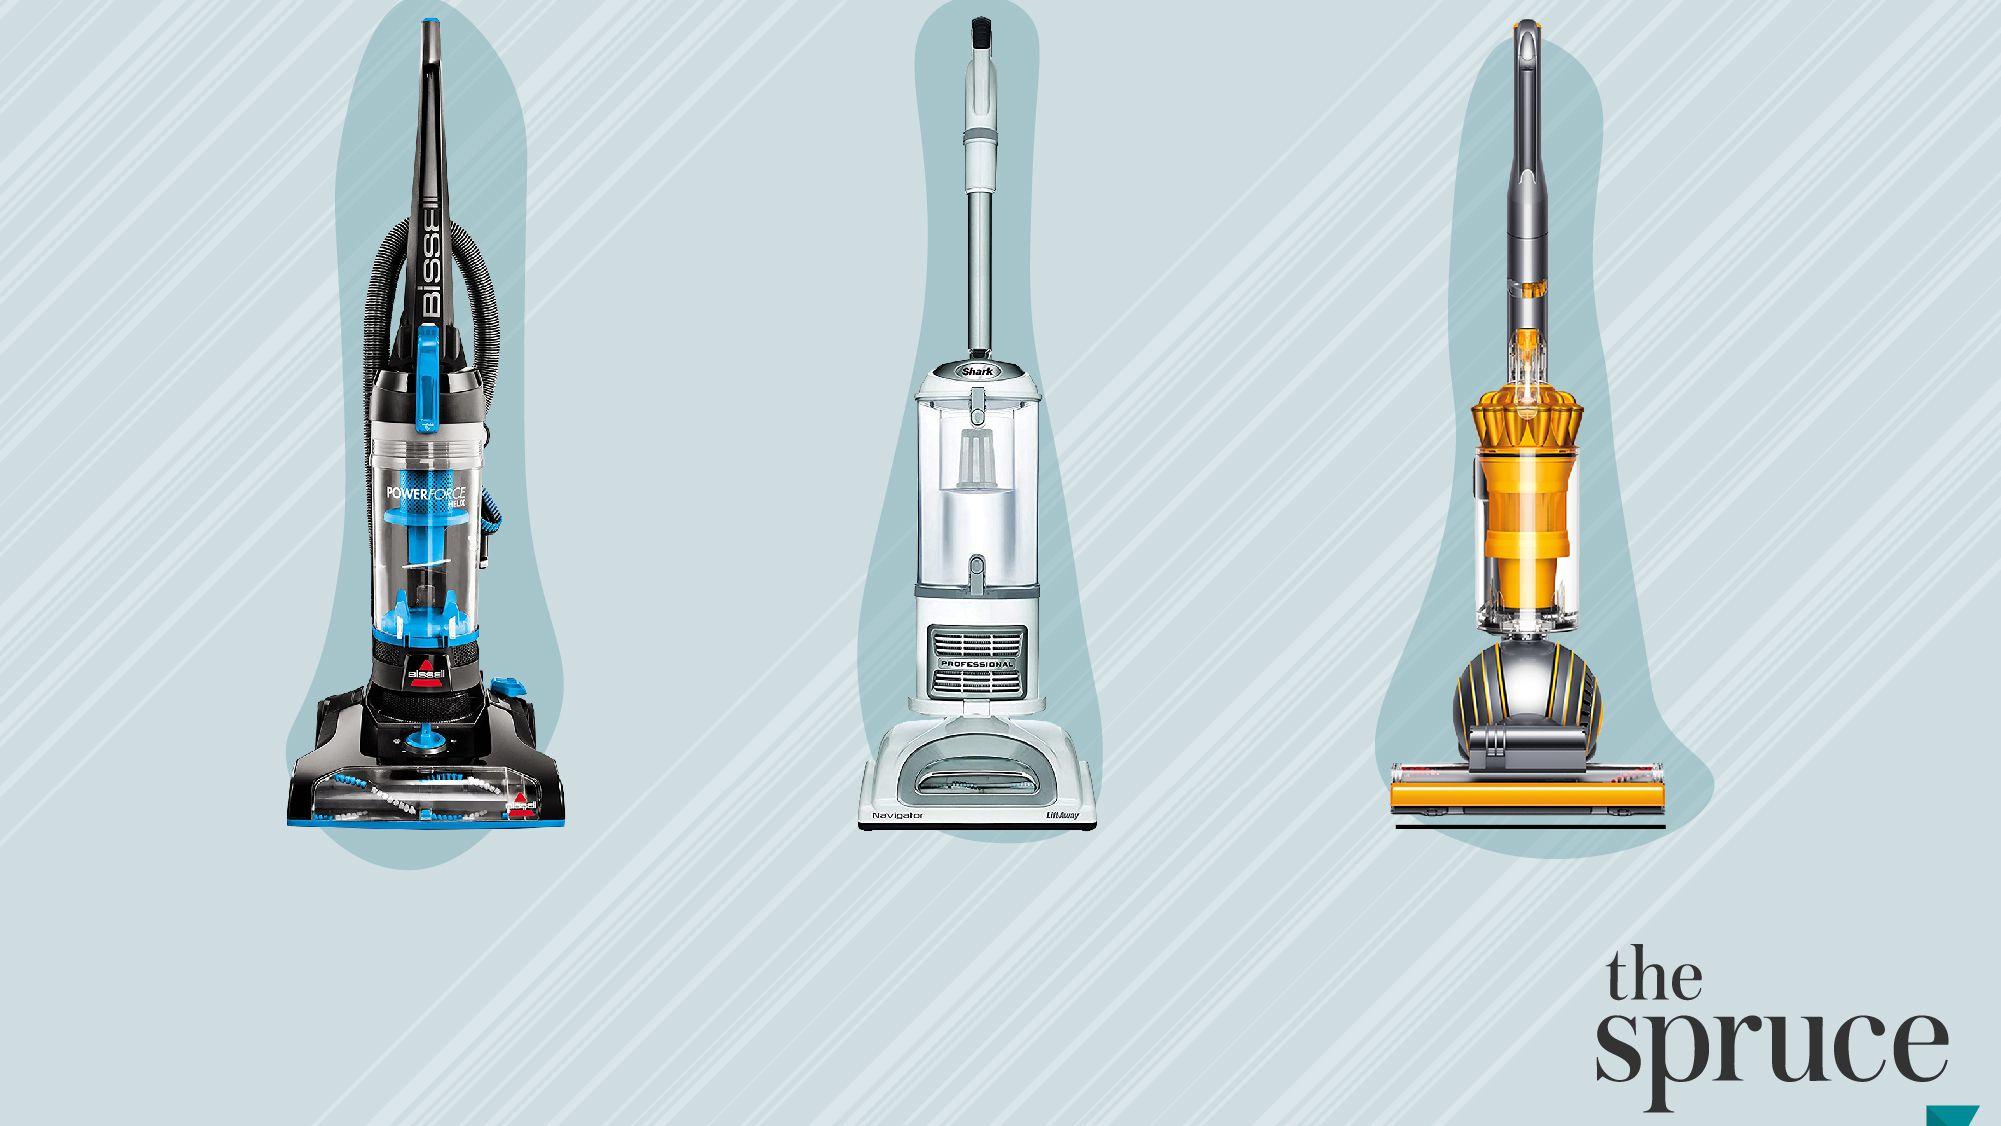 LG Goldstar 5 Vacuum Cleaner Dust V 2600//e//de//982ce//te-vc 1300 M-NS 245